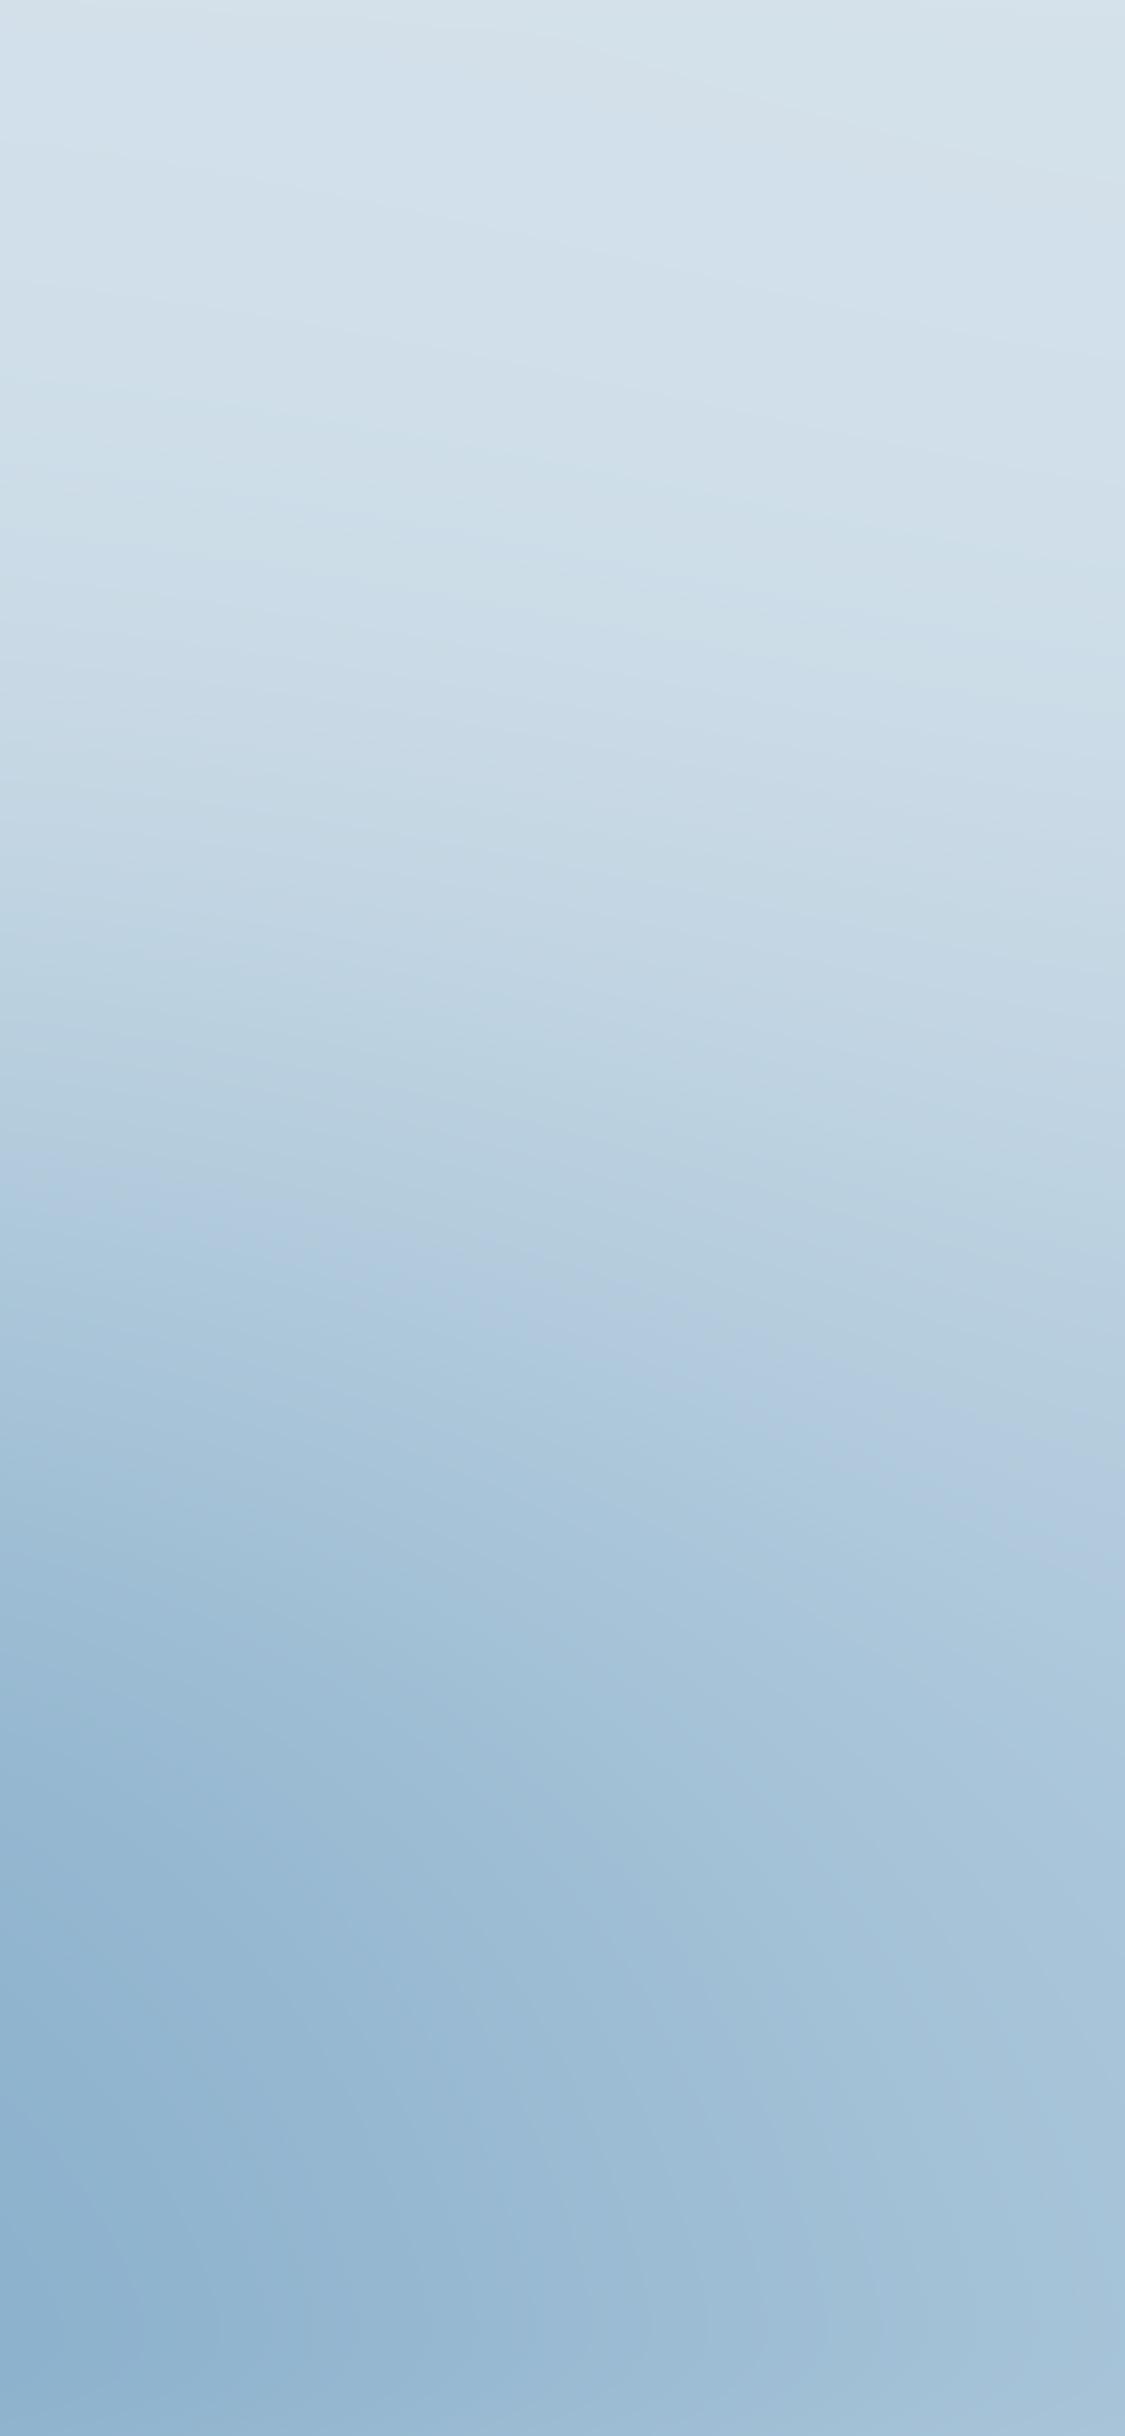 iPhonexpapers.com-Apple-iPhone-wallpaper-sl98-pastel-blue-blur-gradation